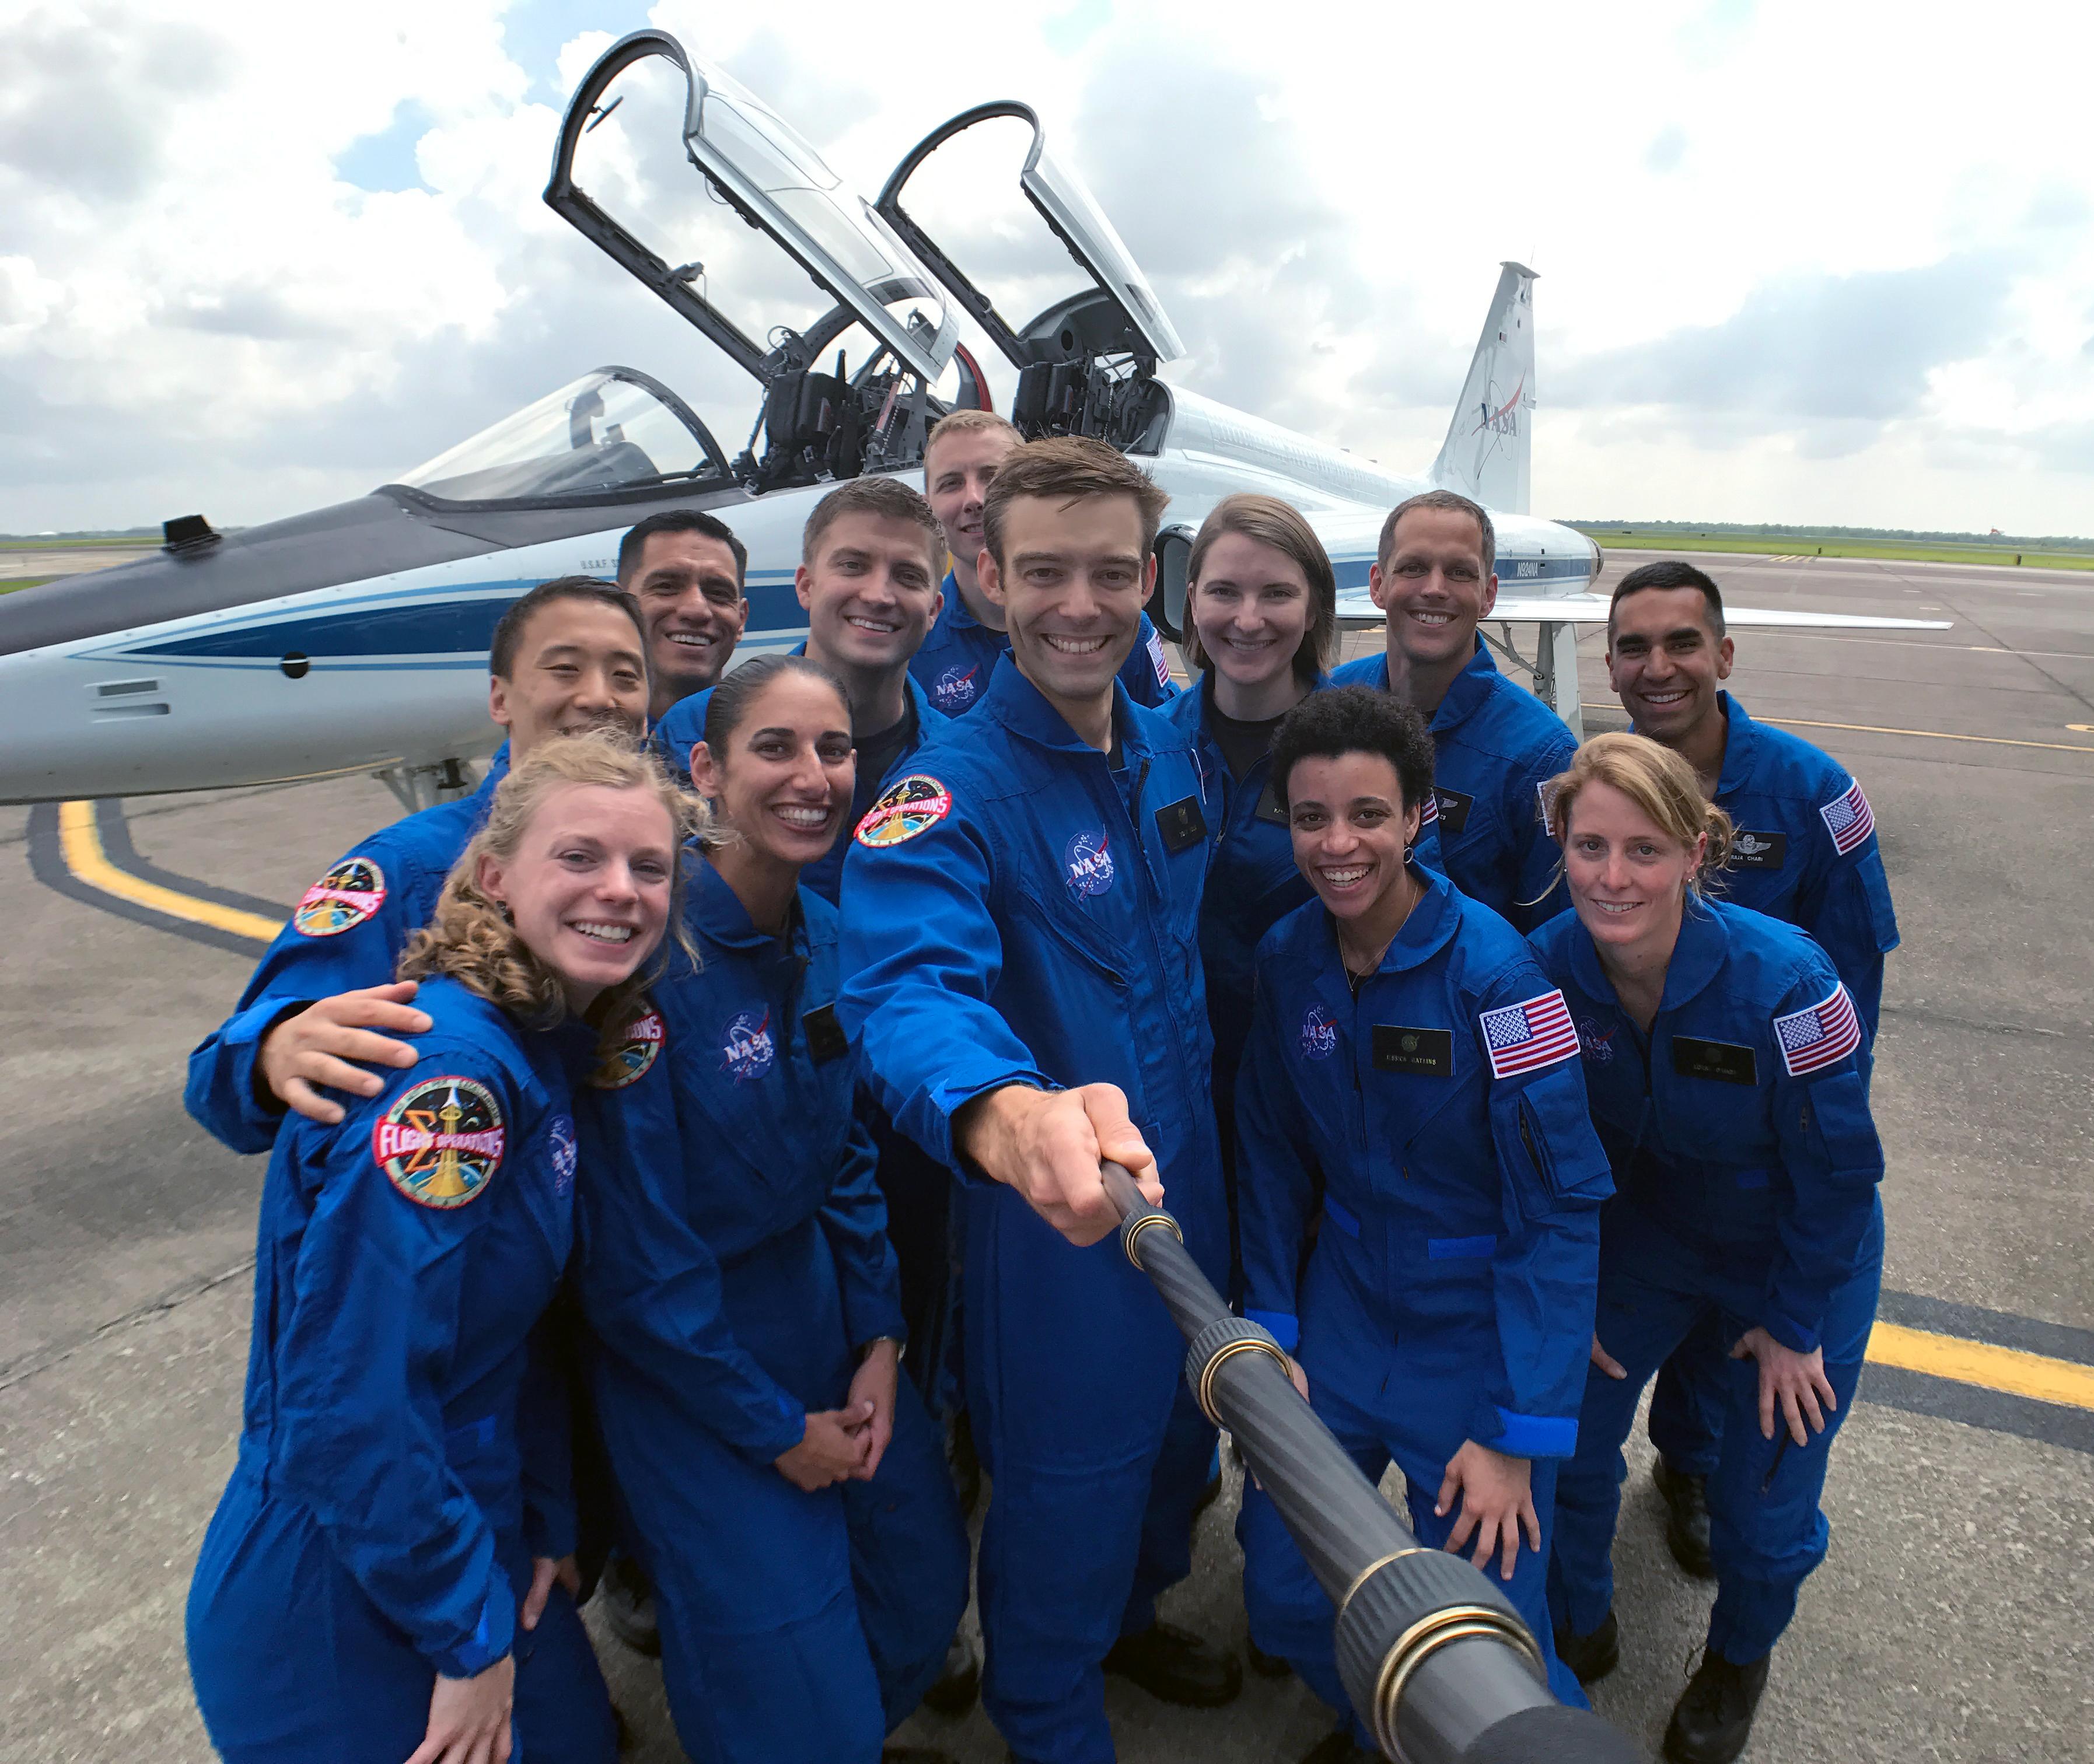 nasa astronauts 2017 - photo #2